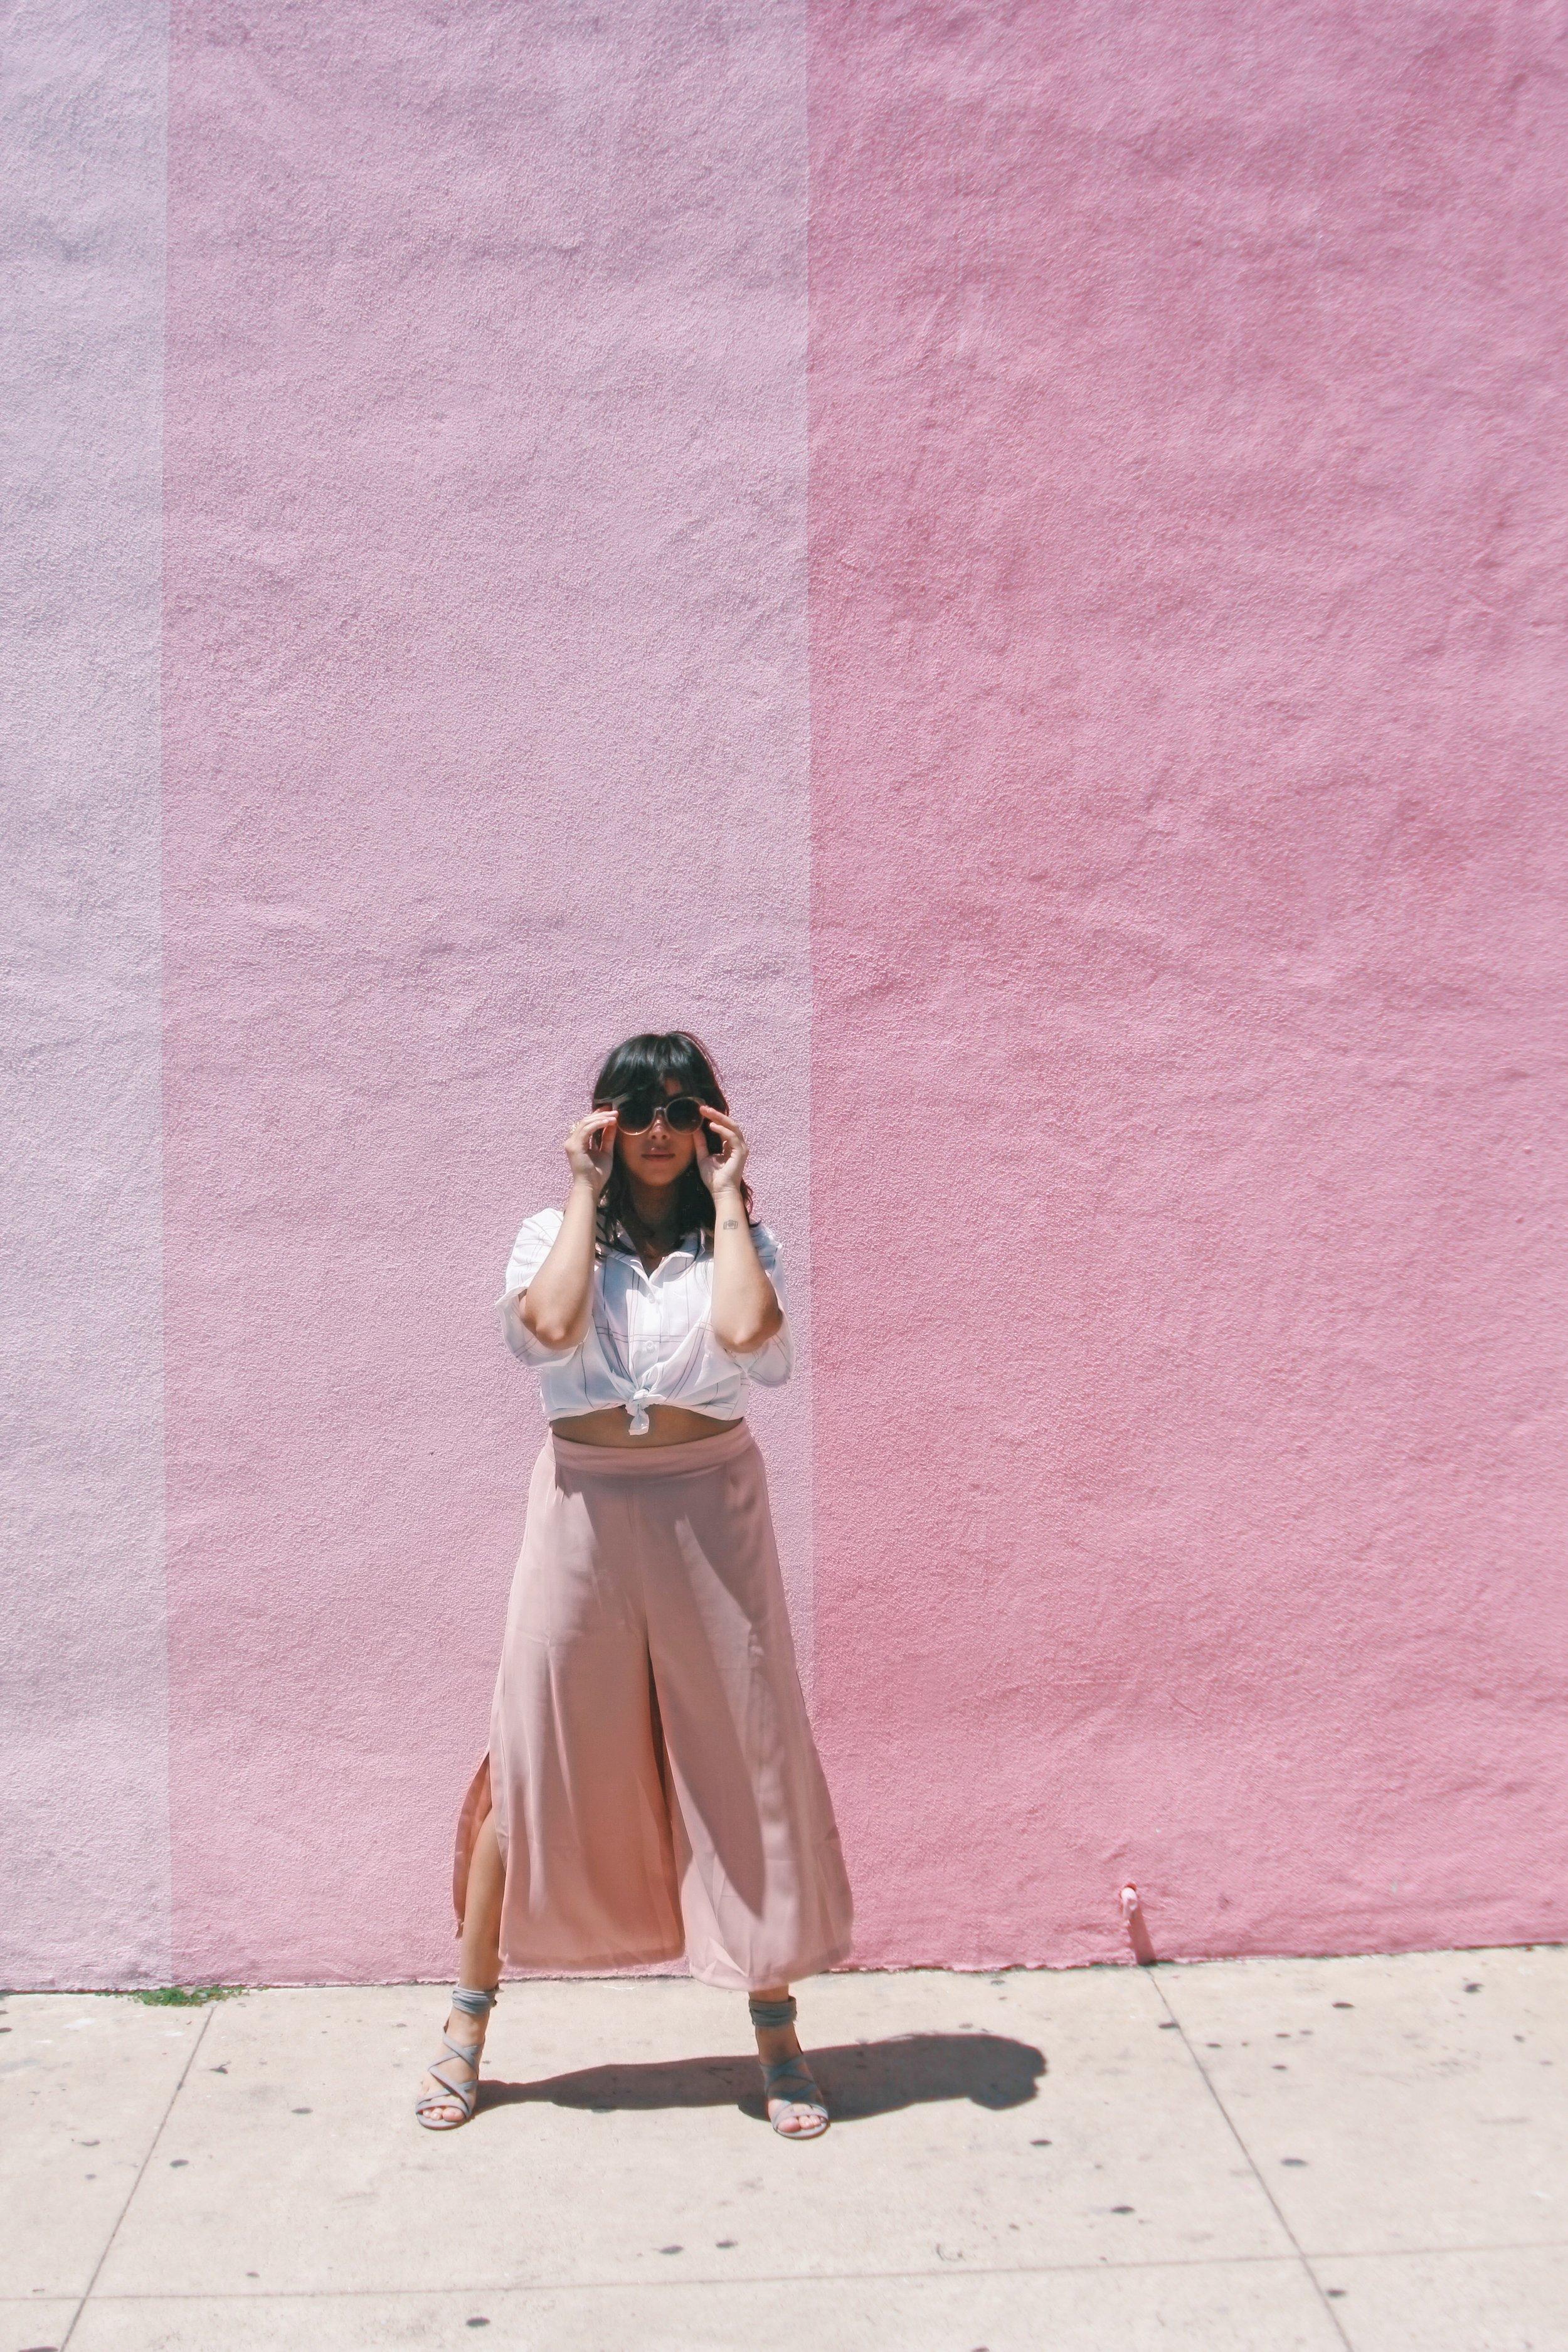 Blusa:  SheIn Culottes:  Graffiti Beach Boutique  Sapatos:  Shoe Dazzle